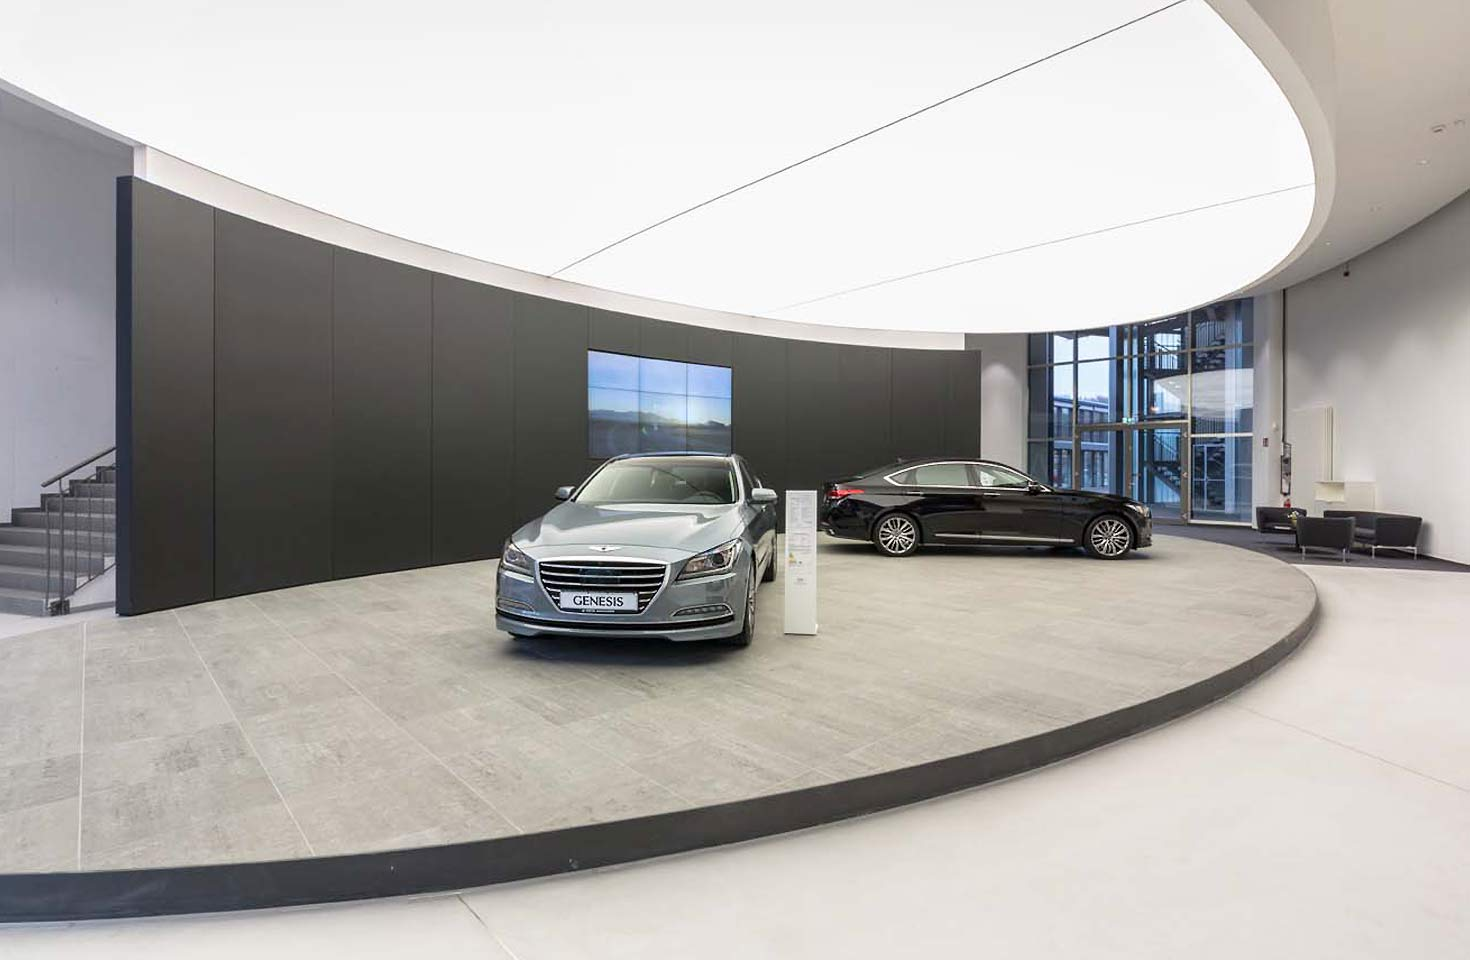 lichtdecke hyundai frankfurt rentex rentex wand und deckensysteme gmbh. Black Bedroom Furniture Sets. Home Design Ideas